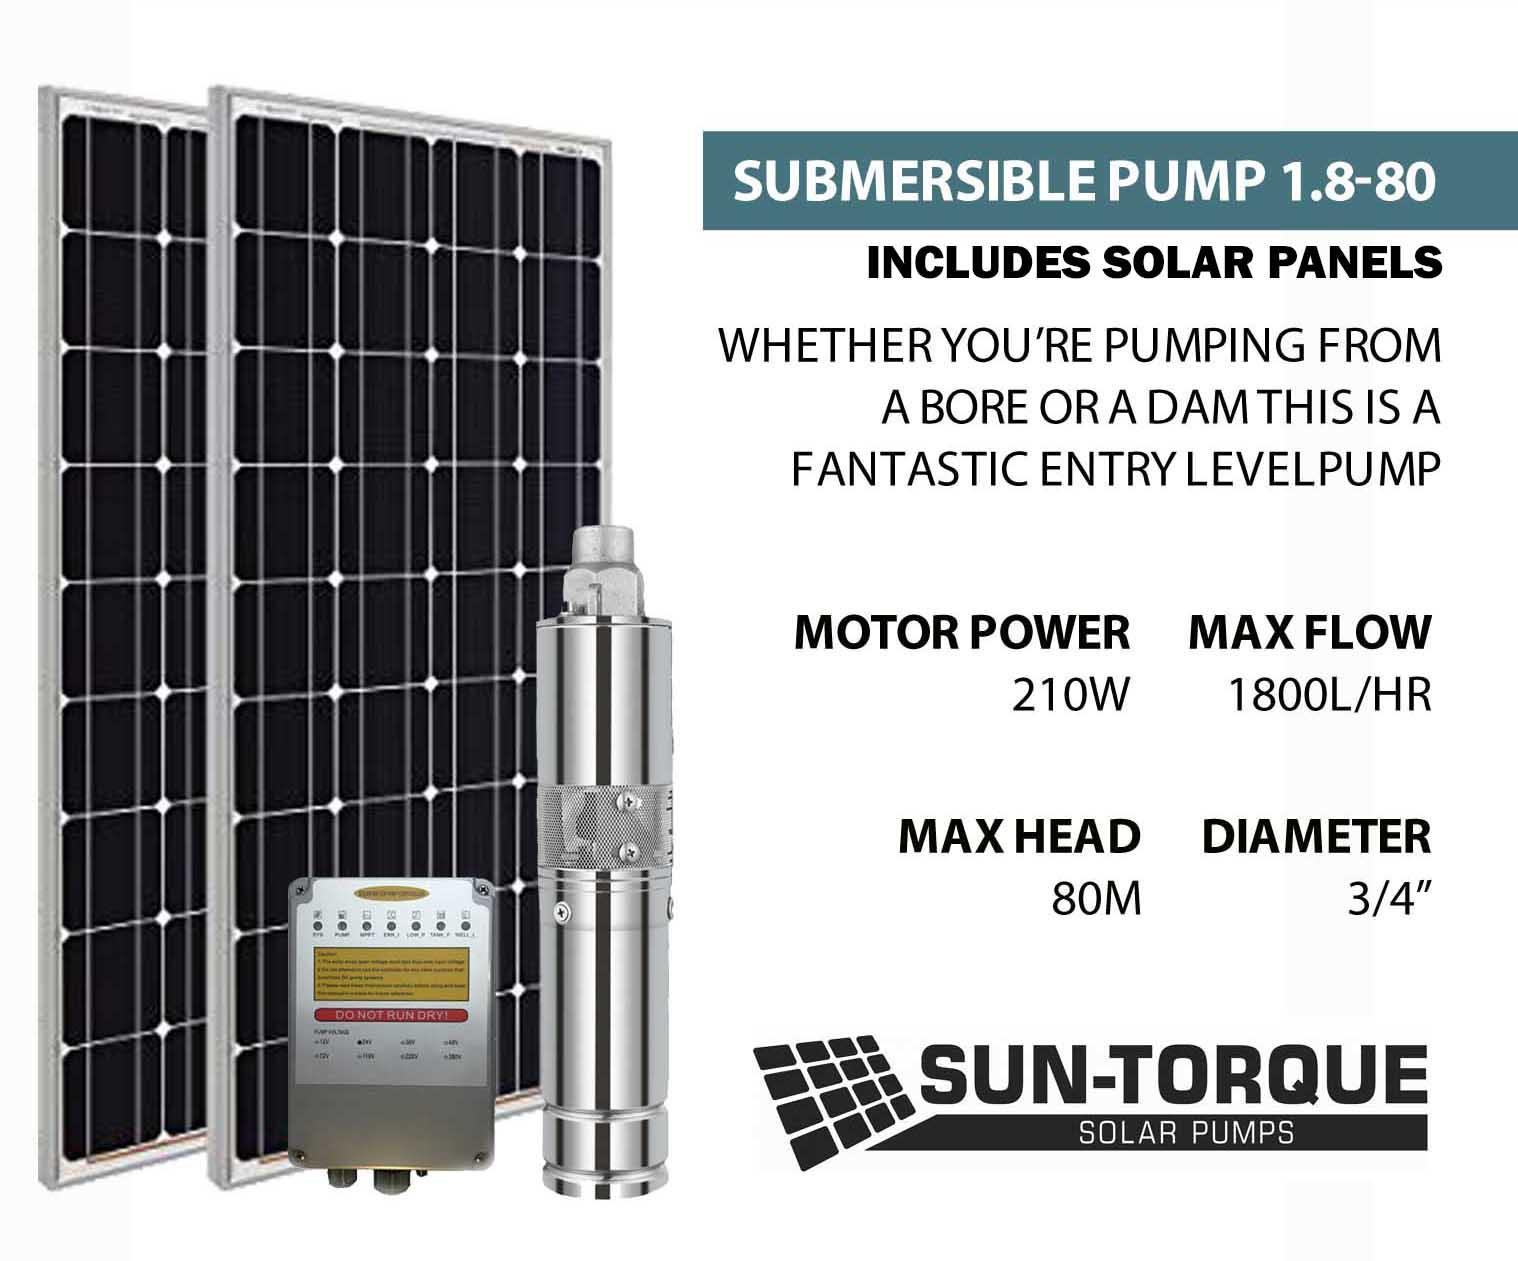 Sun-Torque Submersible 1.8-80 Solar Pump 3 | 1800l/Hr | 80M Head w/ 1 x 275w Solar Panel